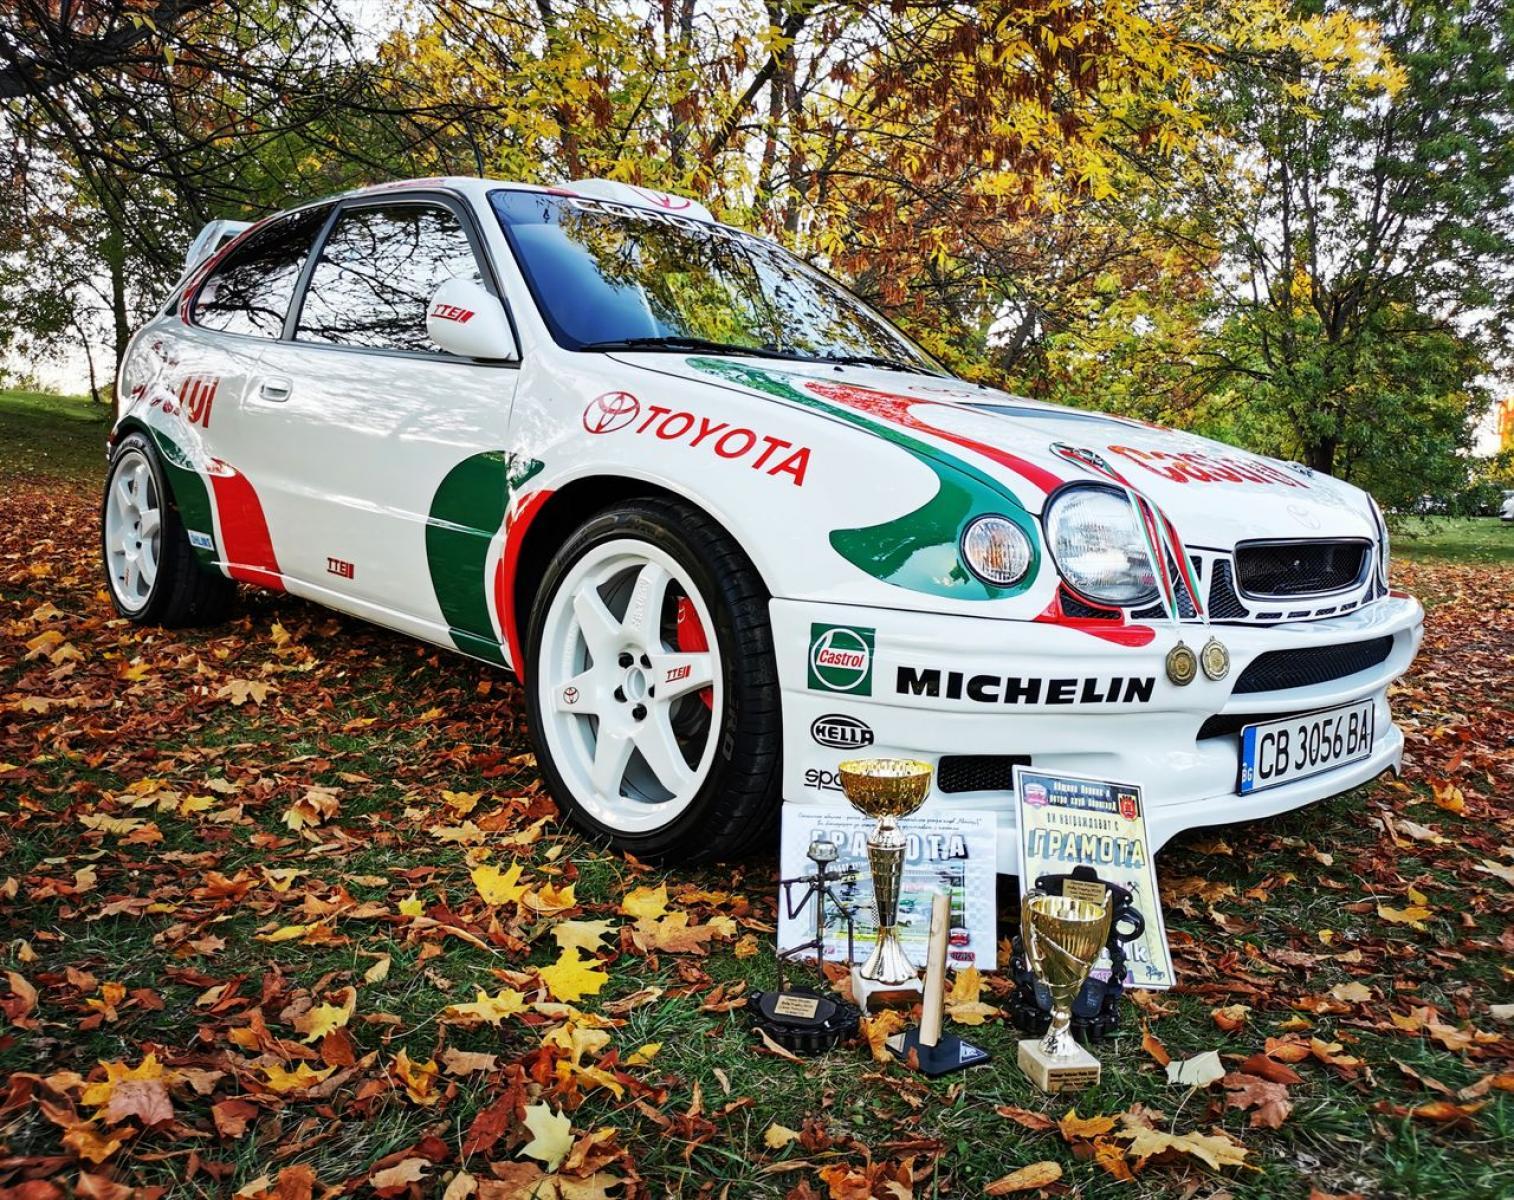 TOYOTA Corolla WRC Replica - 1